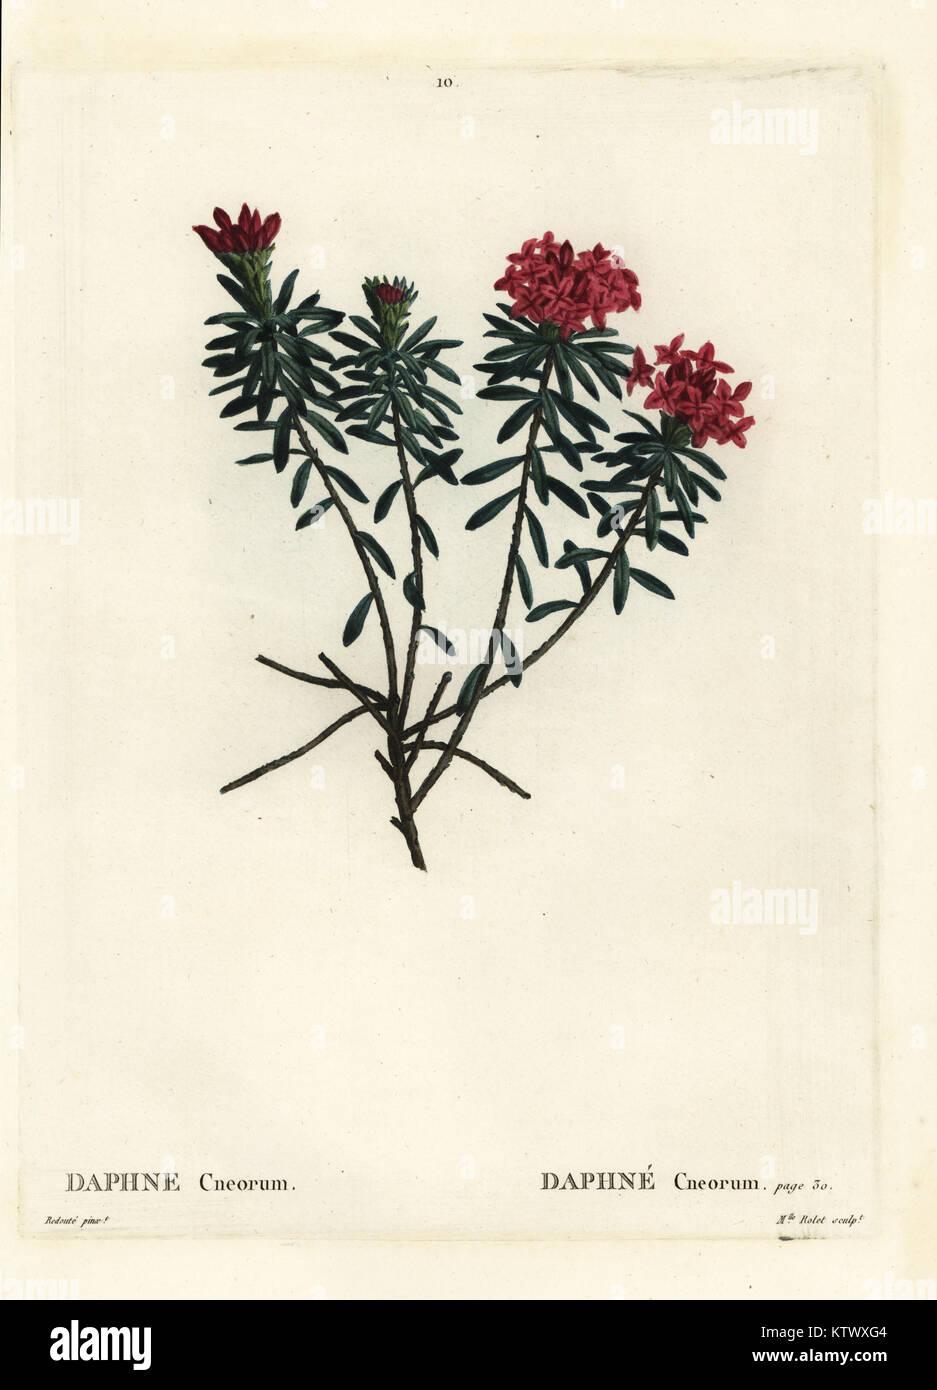 Garland flower or rose daphne, Daphne cneorum. Handcoloured stipple engraving by  Mlle. Rolet after an illustration - Stock Image